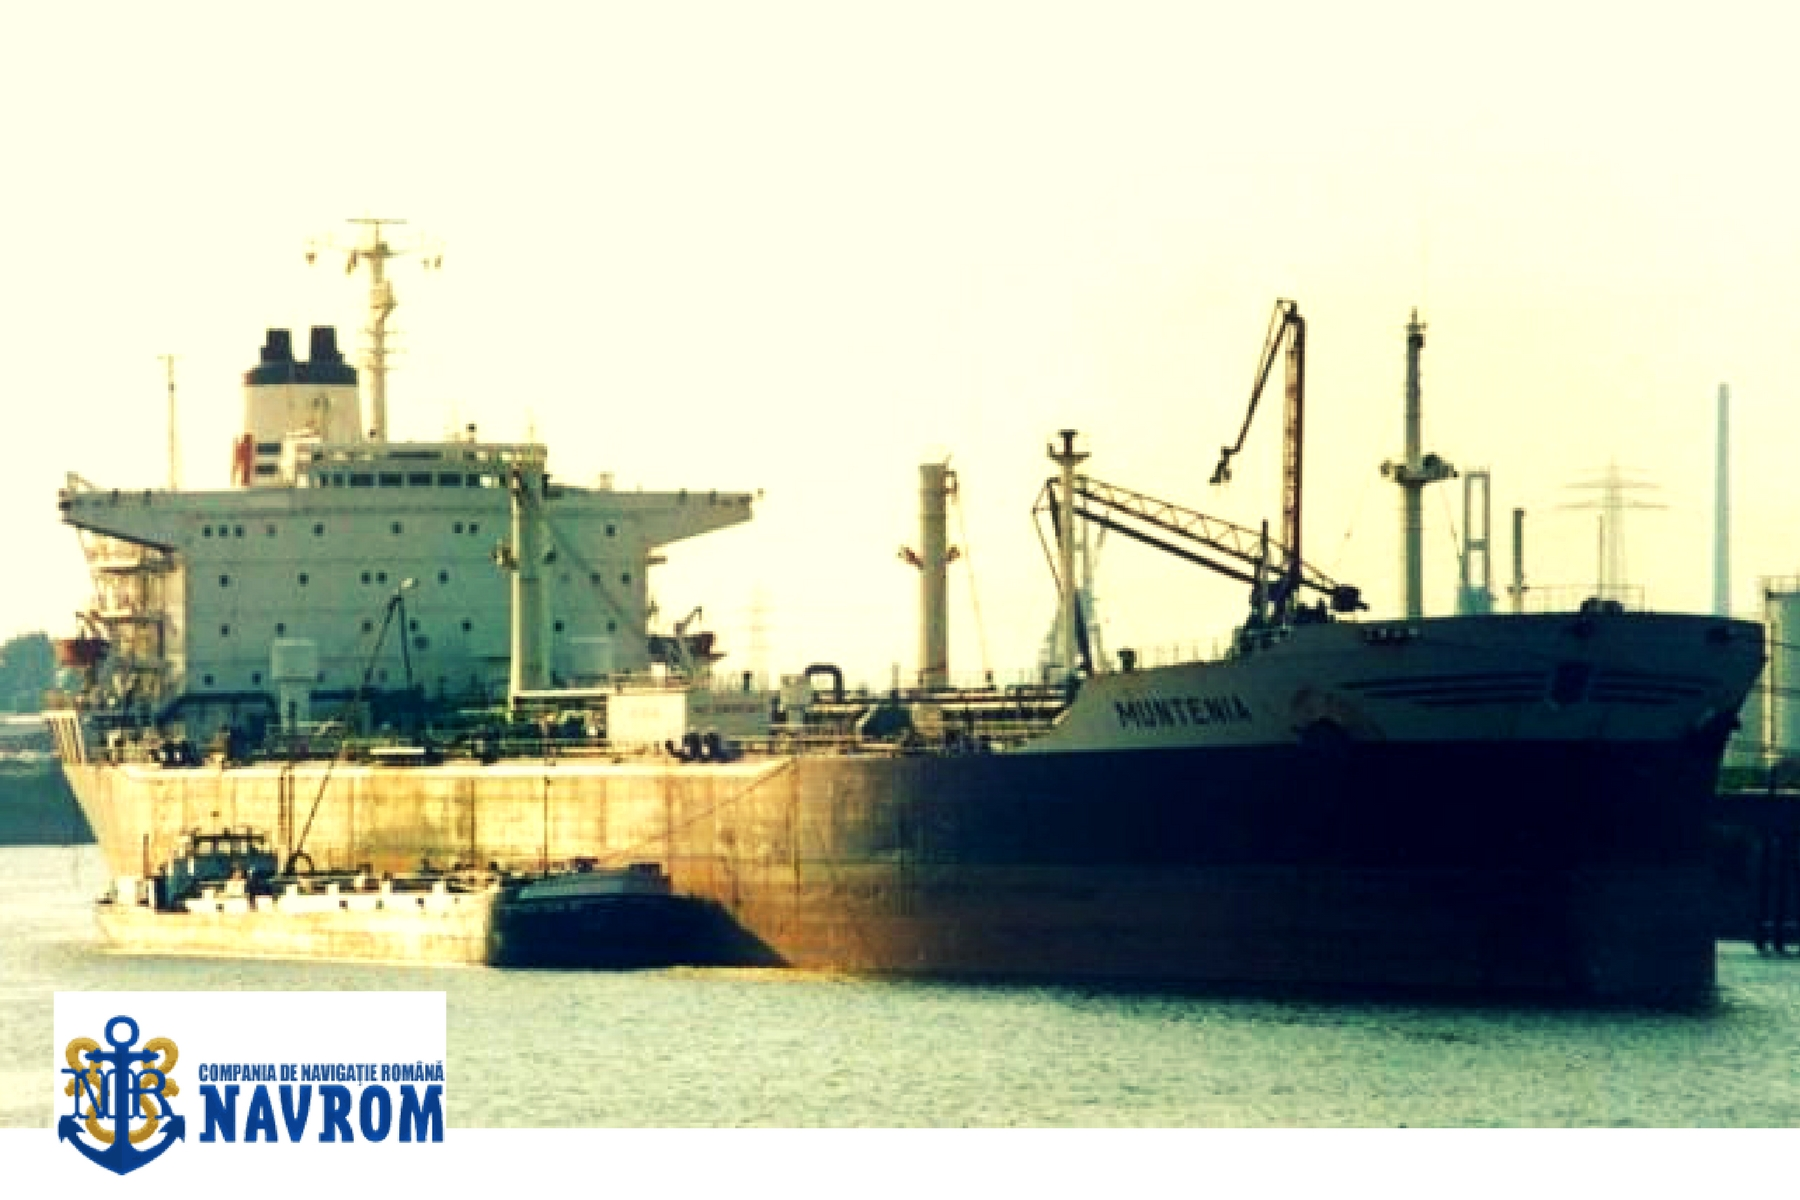 Tancul petrolier MUNTENIA - Compania de Navigatie NAVROM Constanta